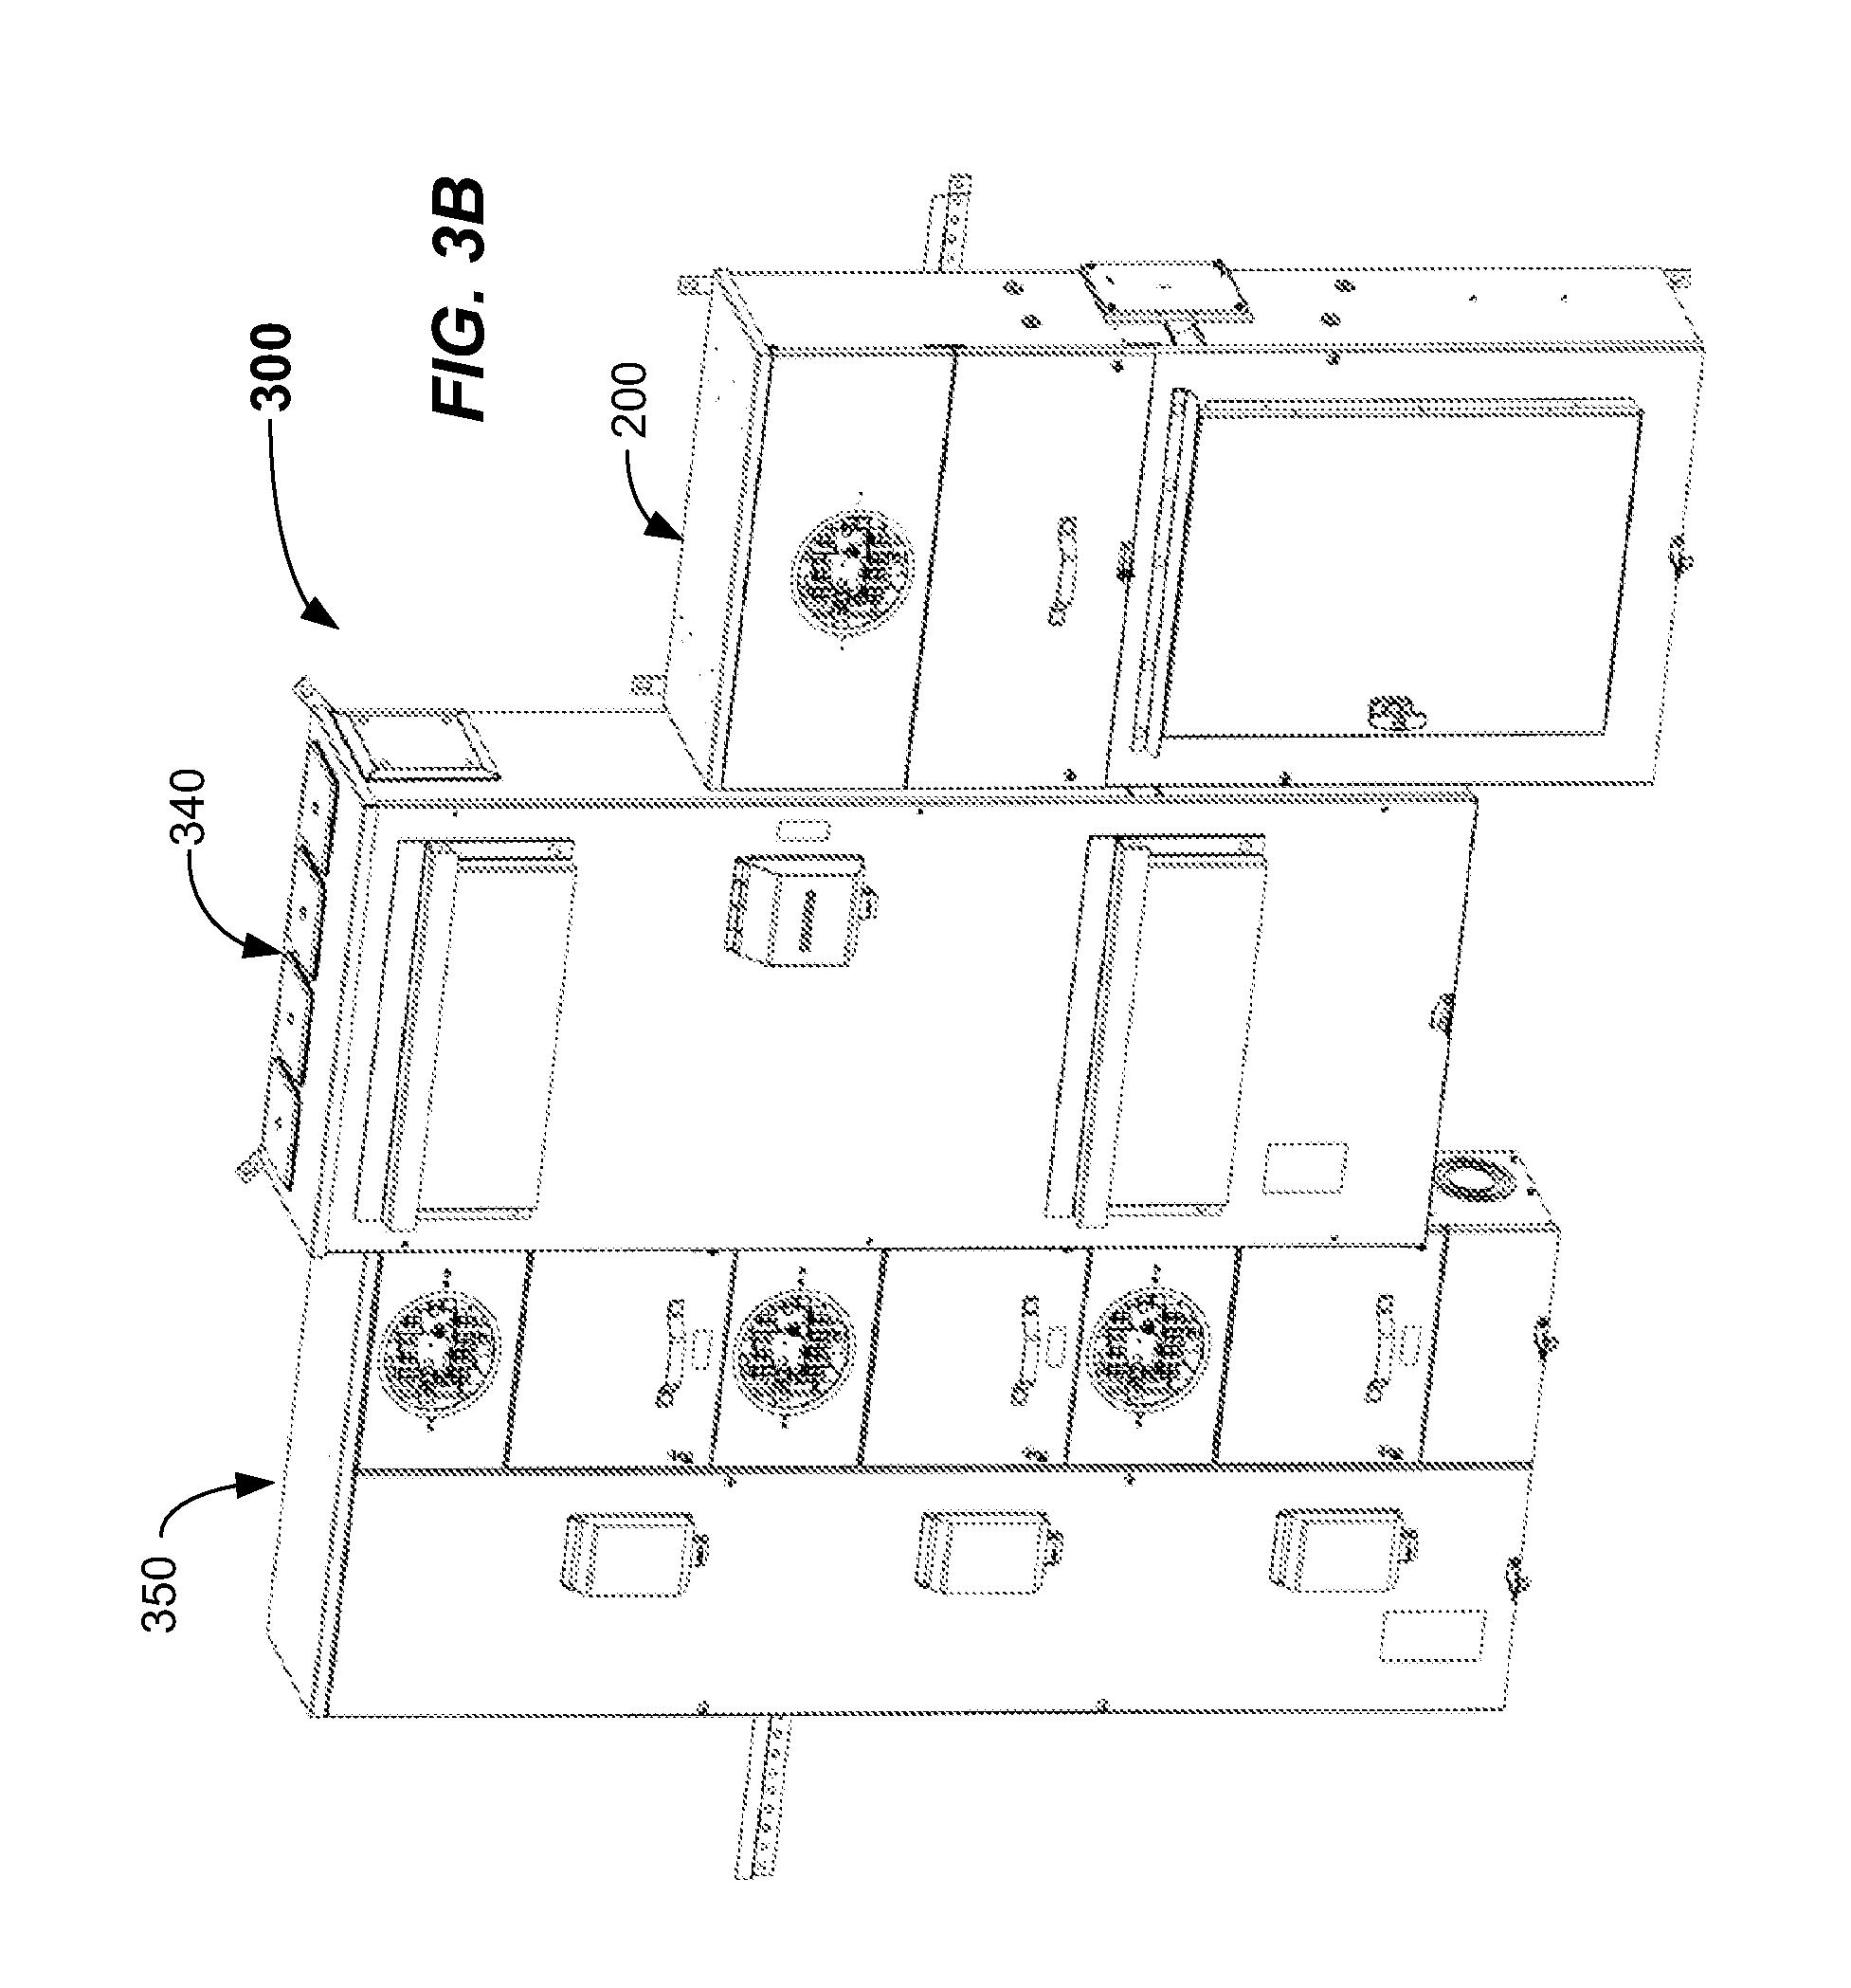 kohler key switch wiring diagram bmw 2002 command 18 ignition